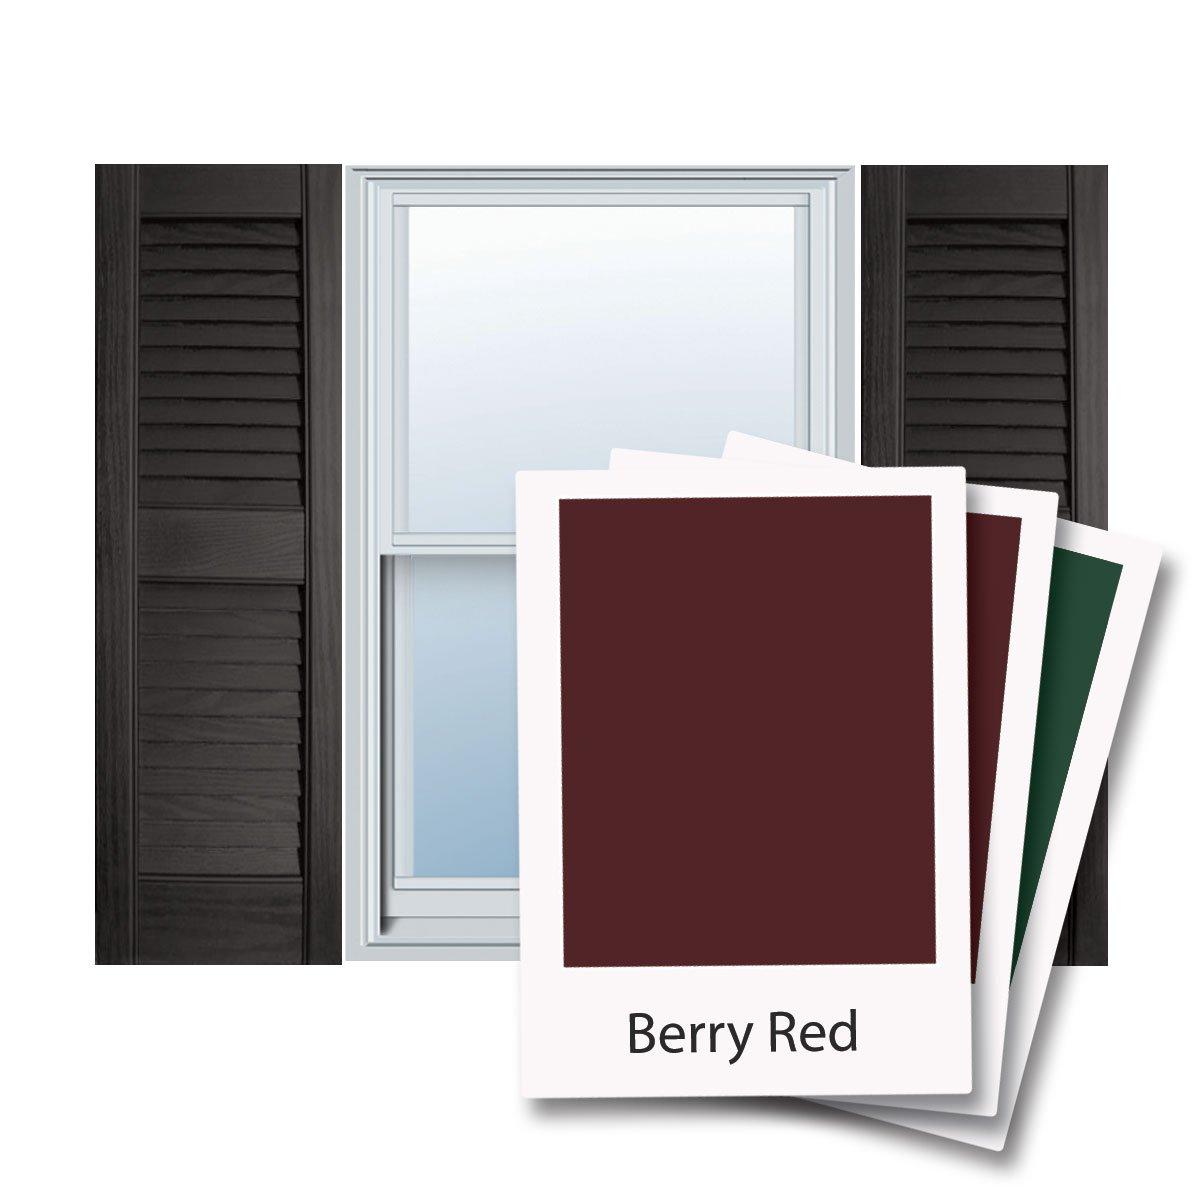 12'' x 28'' Builders Choice Vinyl Open Louver Window Shutters, w/Shutter Spikes & Screws (Per Pair), Berry Red